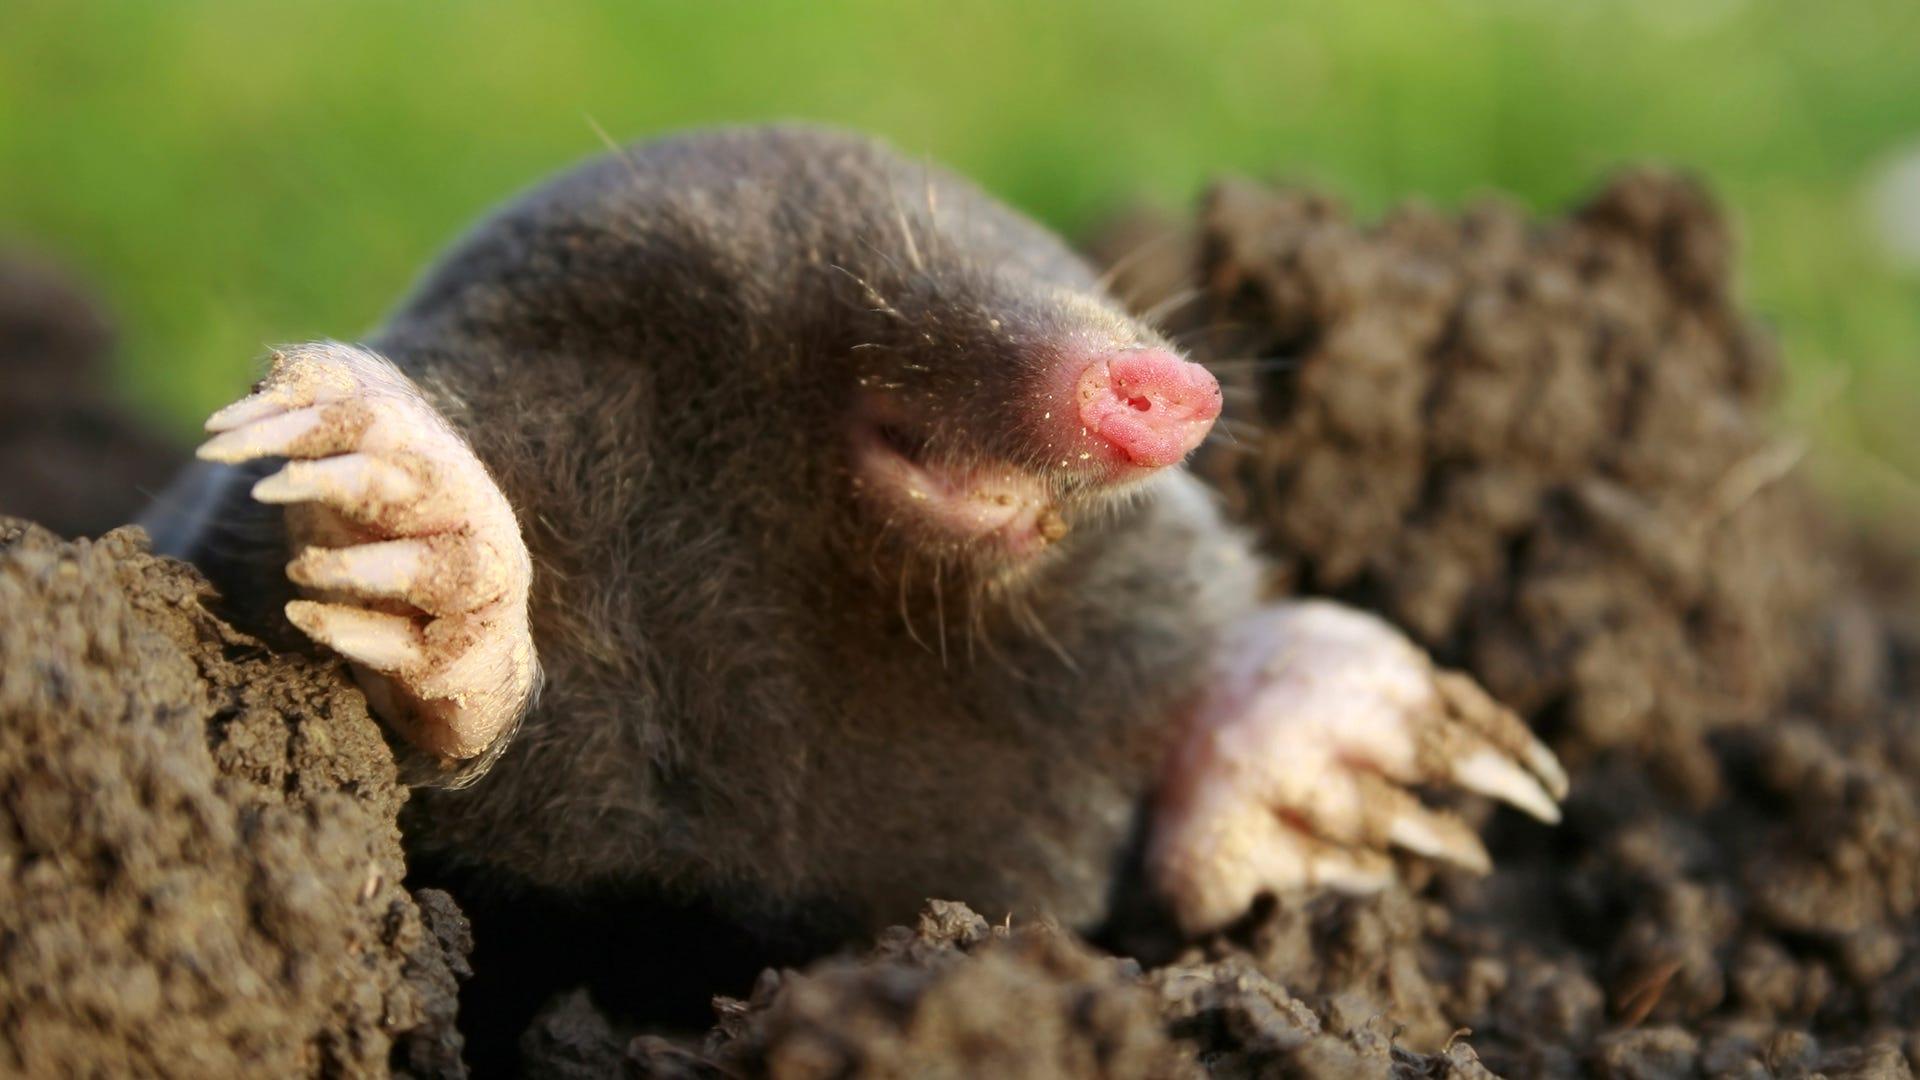 Common Myths About Moles